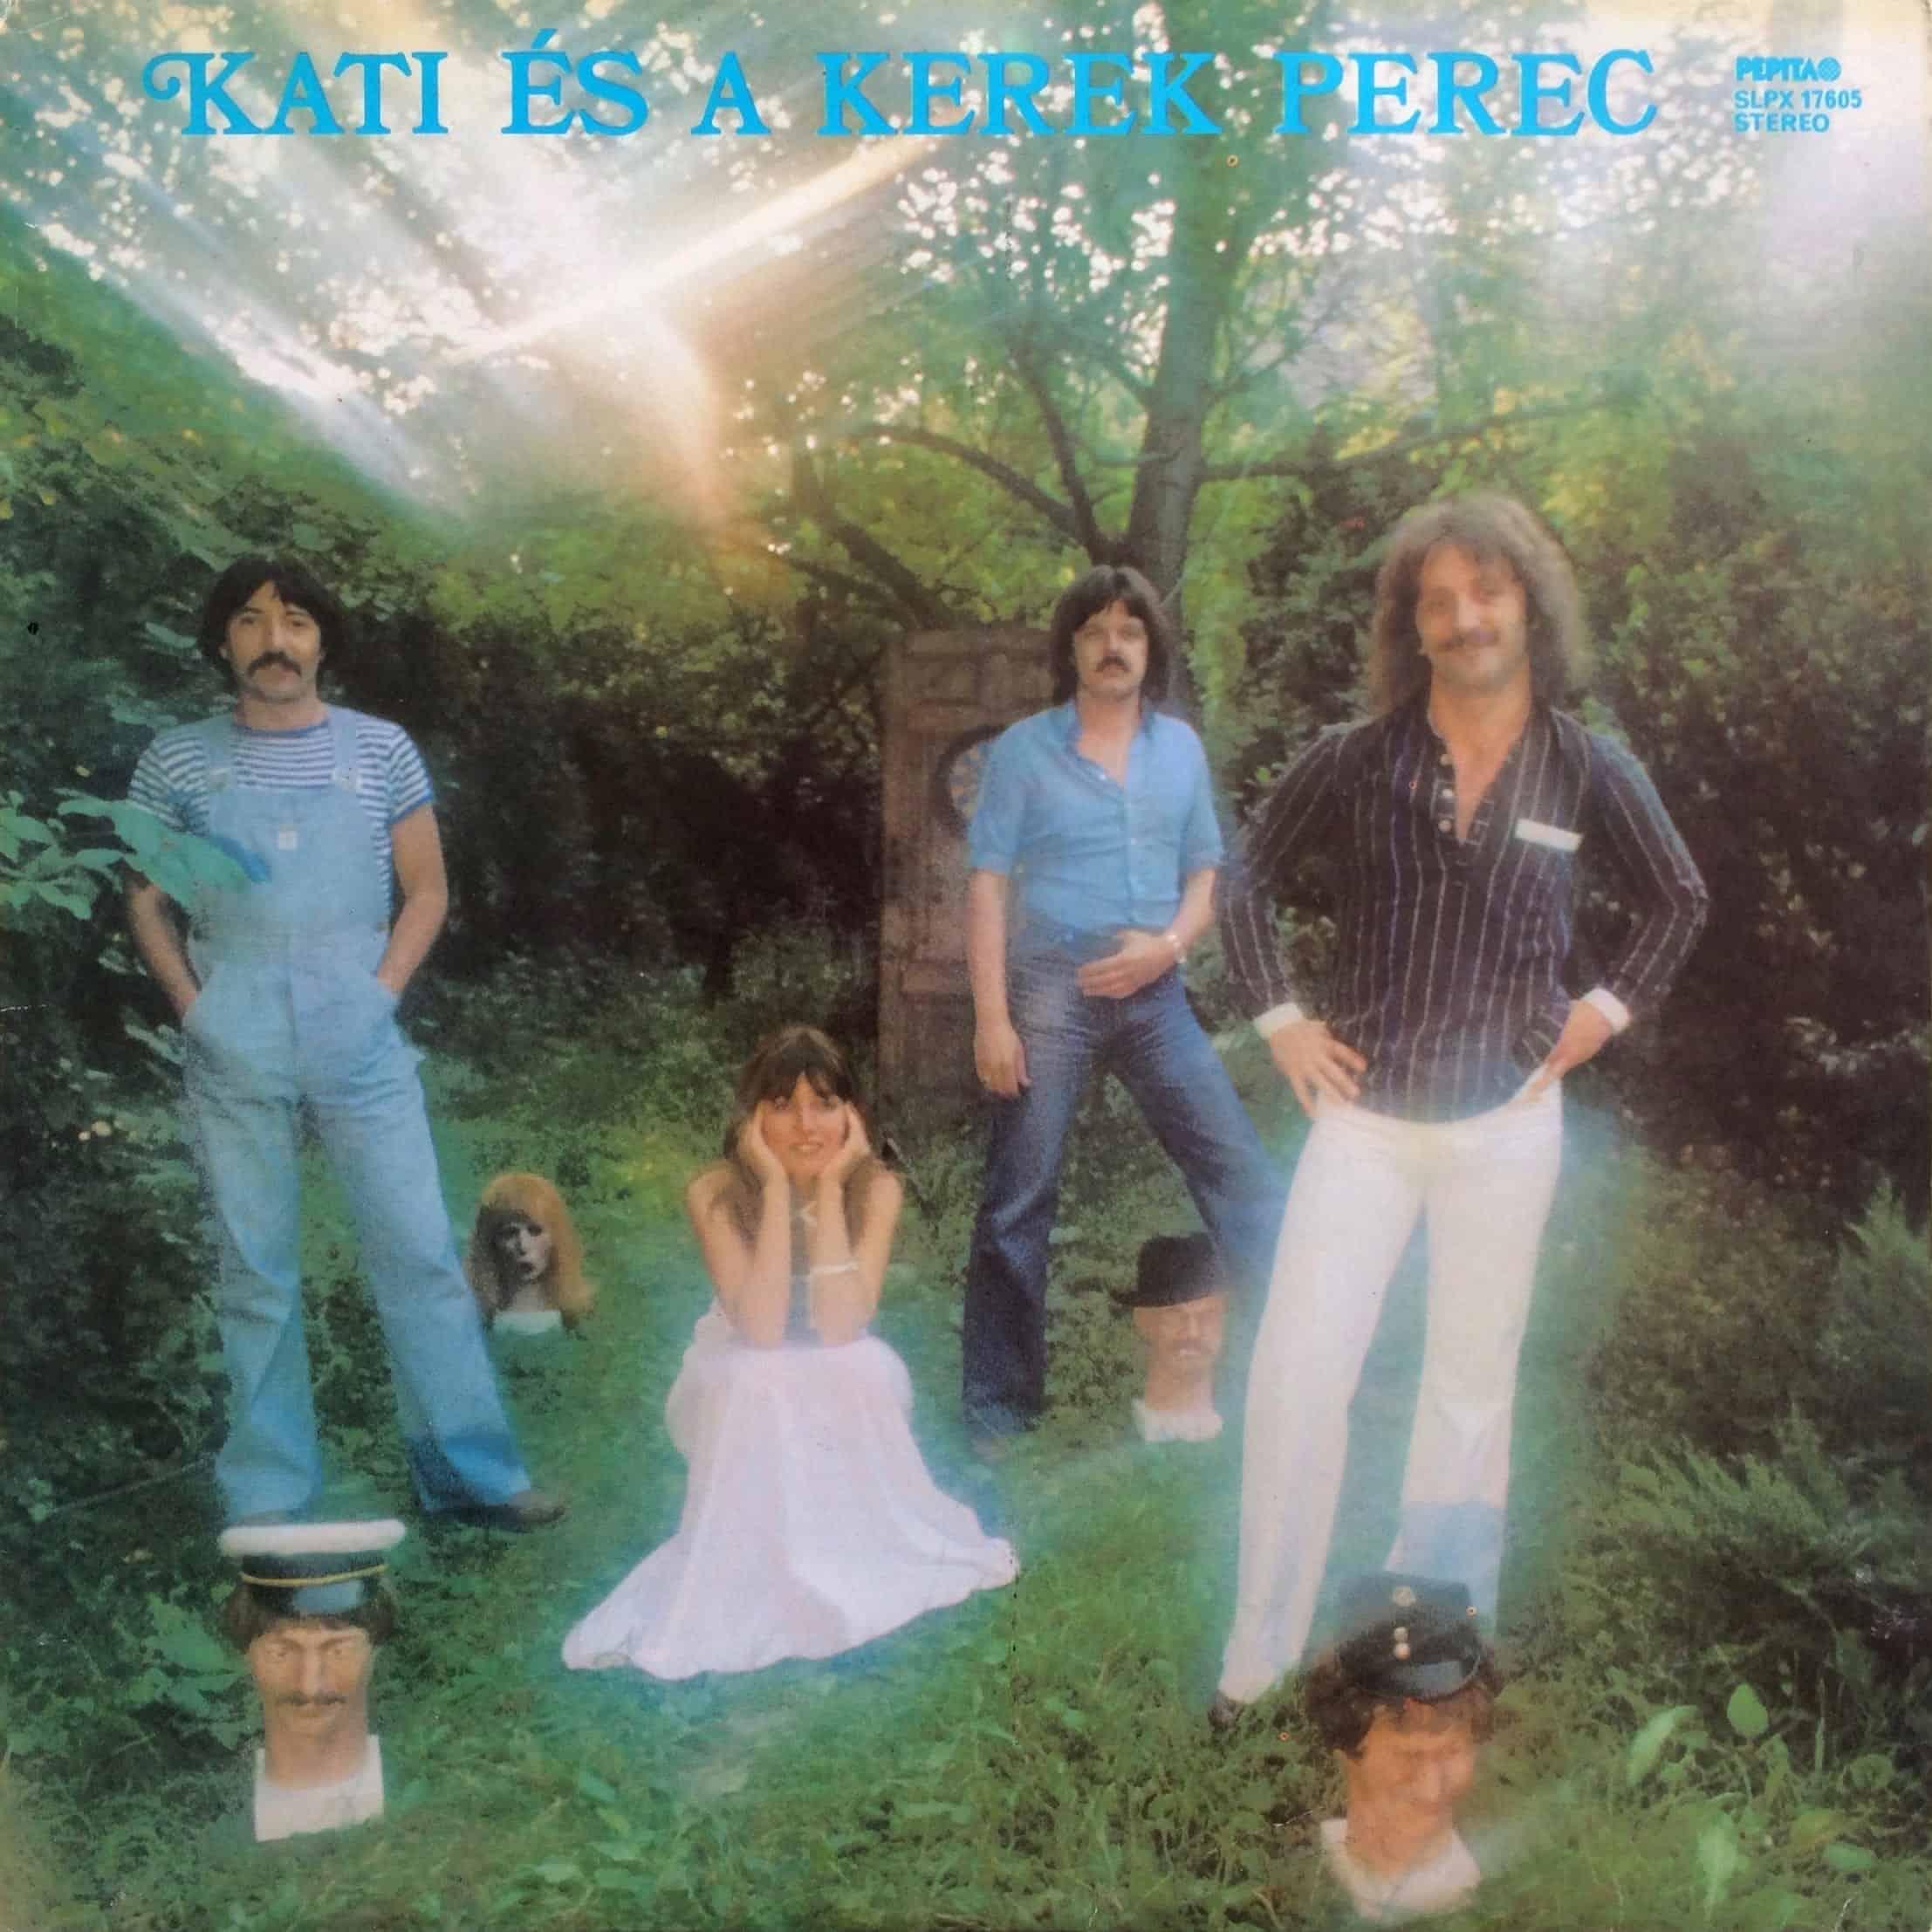 Kati És A Kerek Perec 1979 Pepita – SLPX 17605